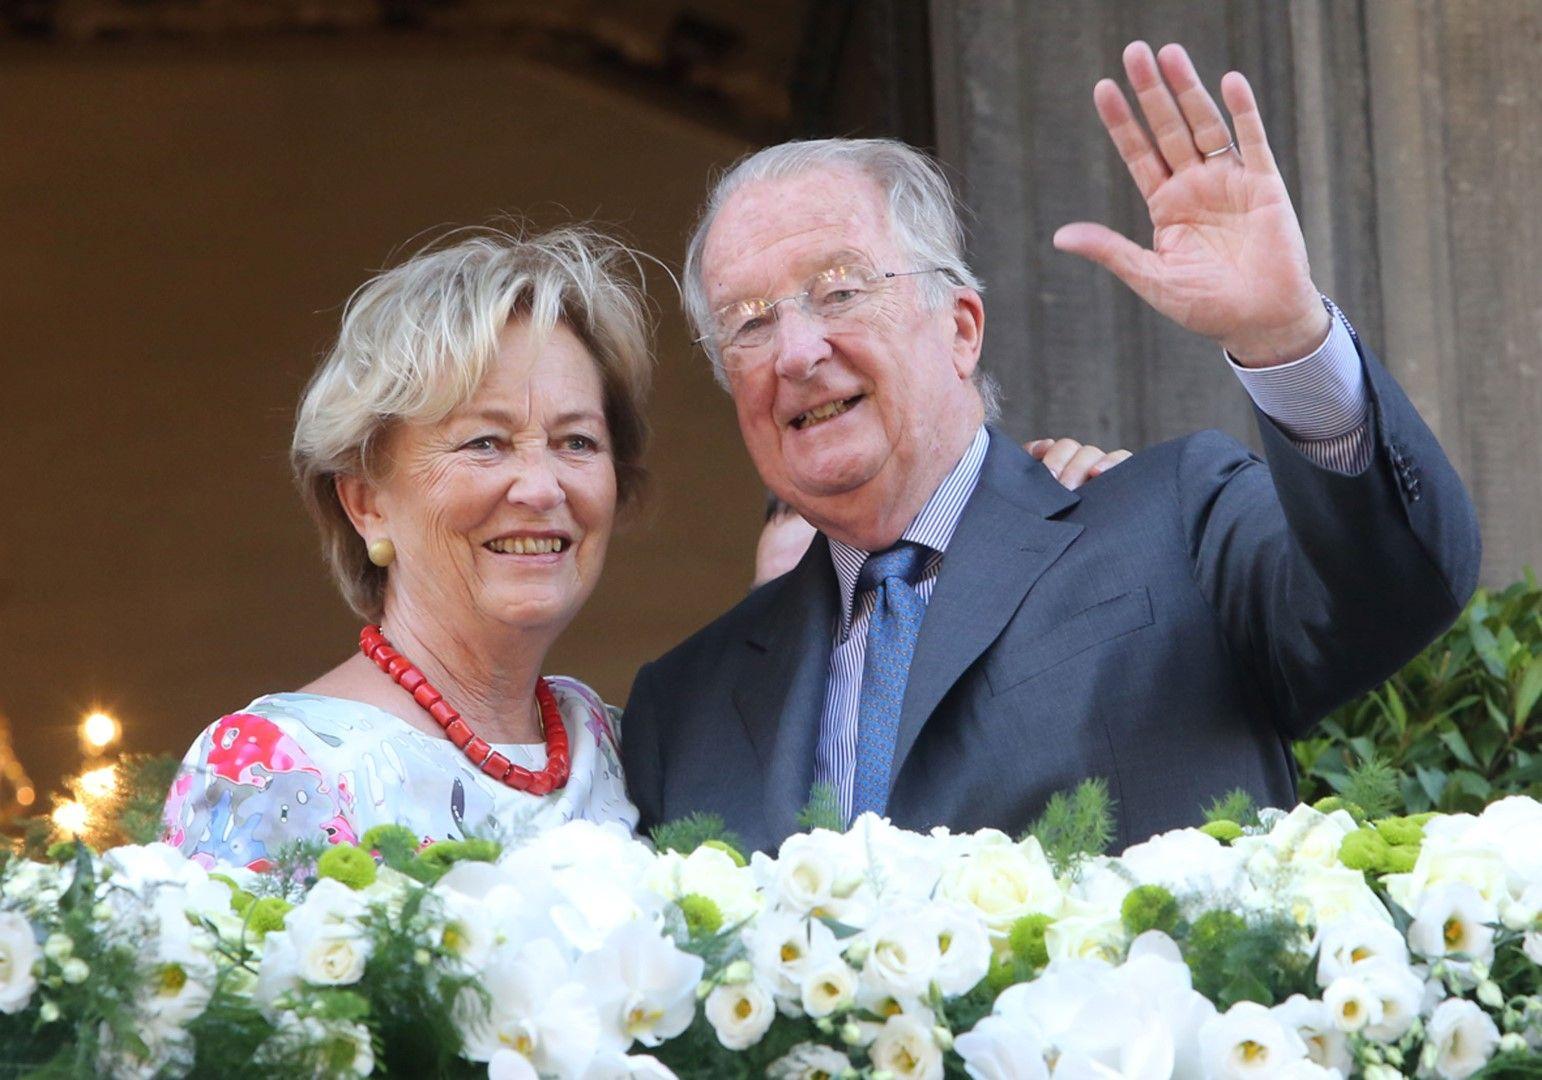 Кралят на Белгия Албер II и кралица Паола Кралят на Белгия Албер II и кралица Паола (архивни кадри)